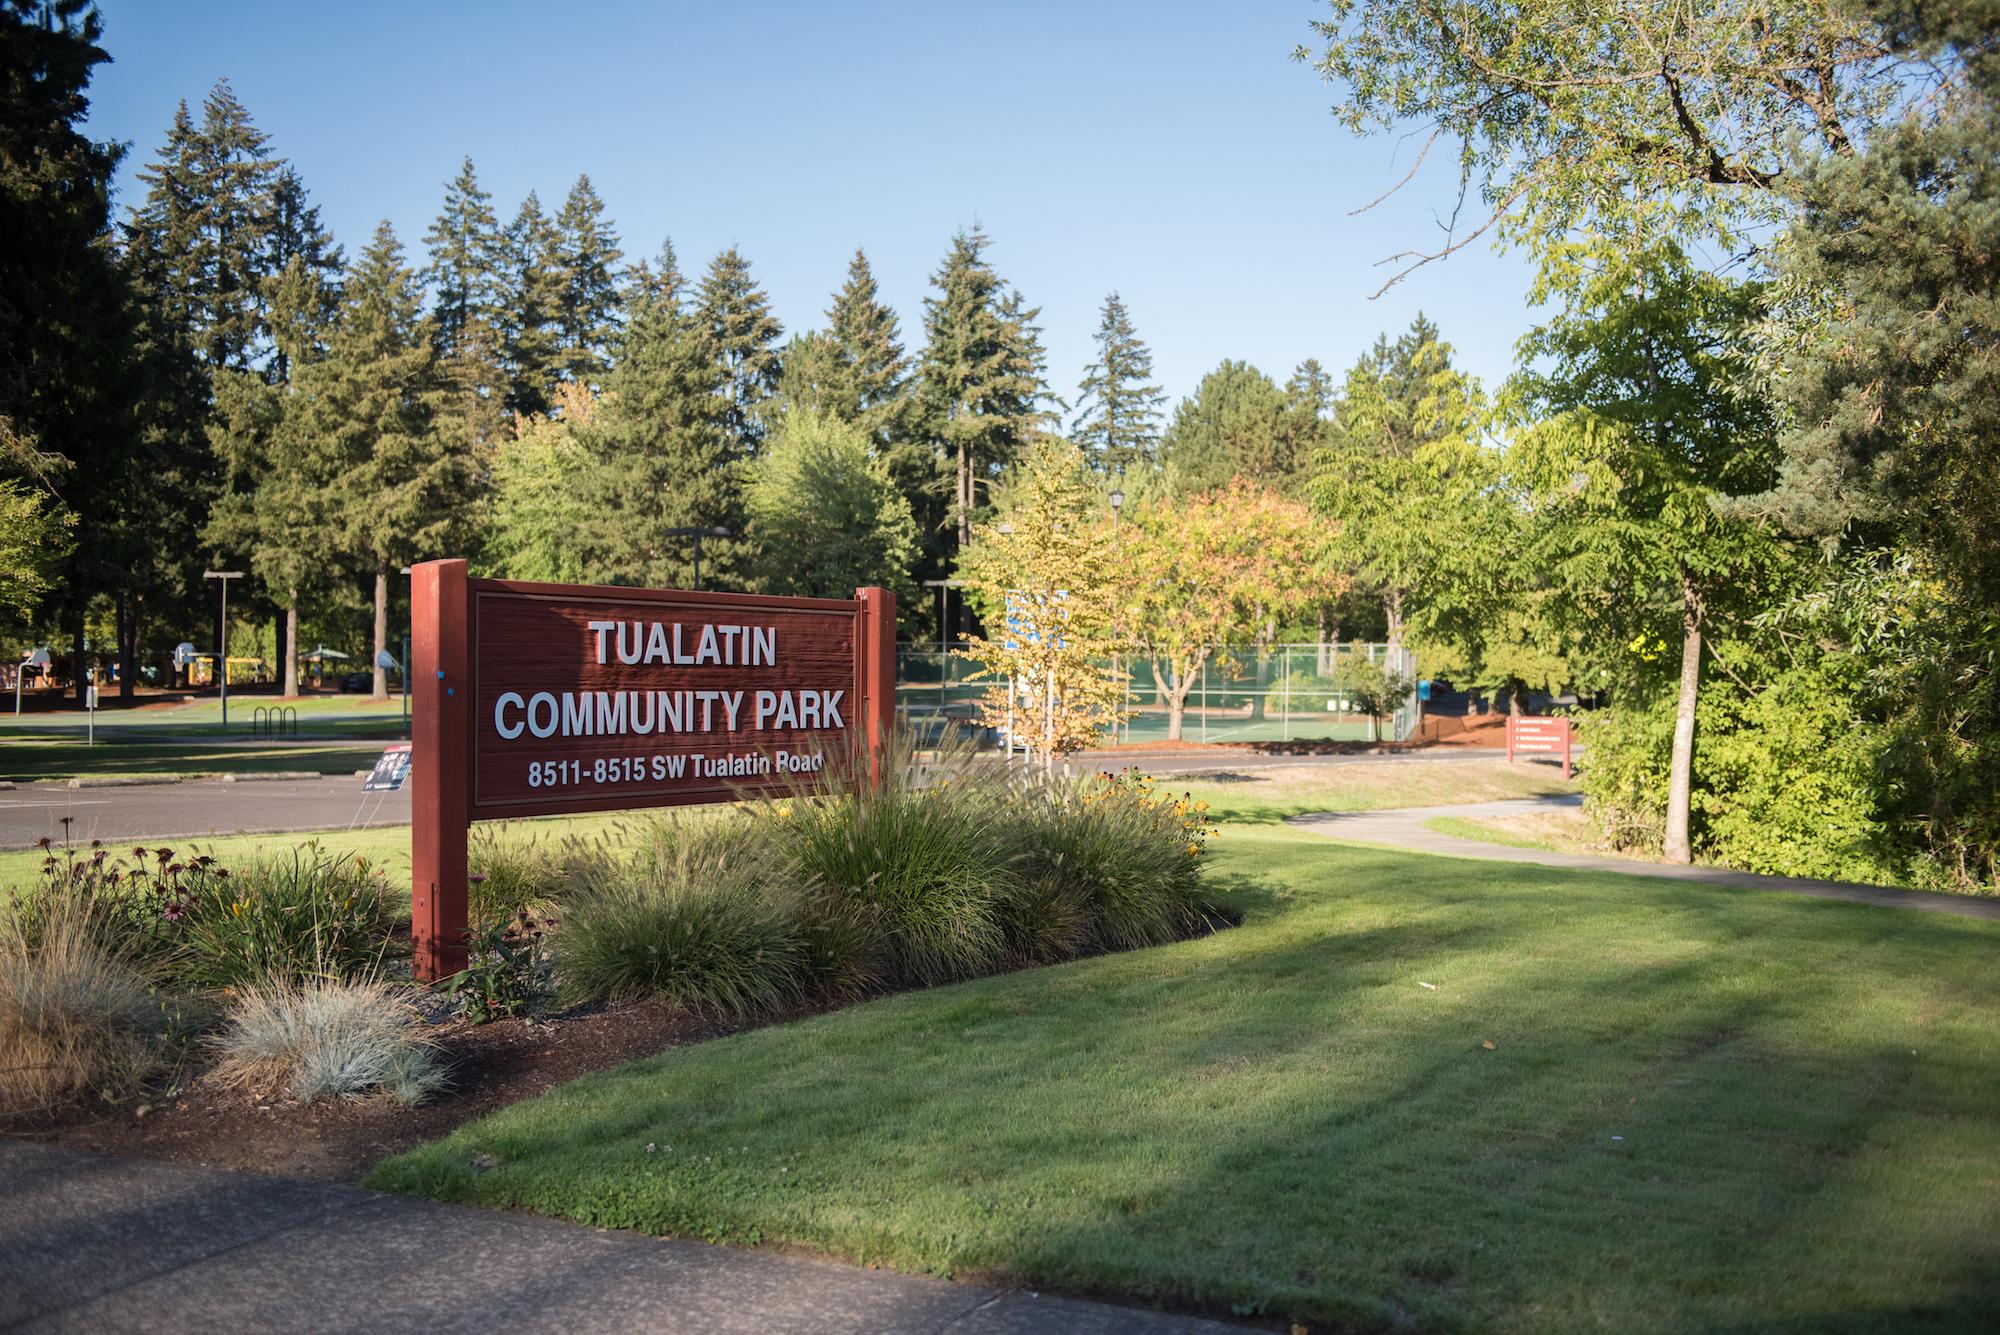 Tualatin Community Park